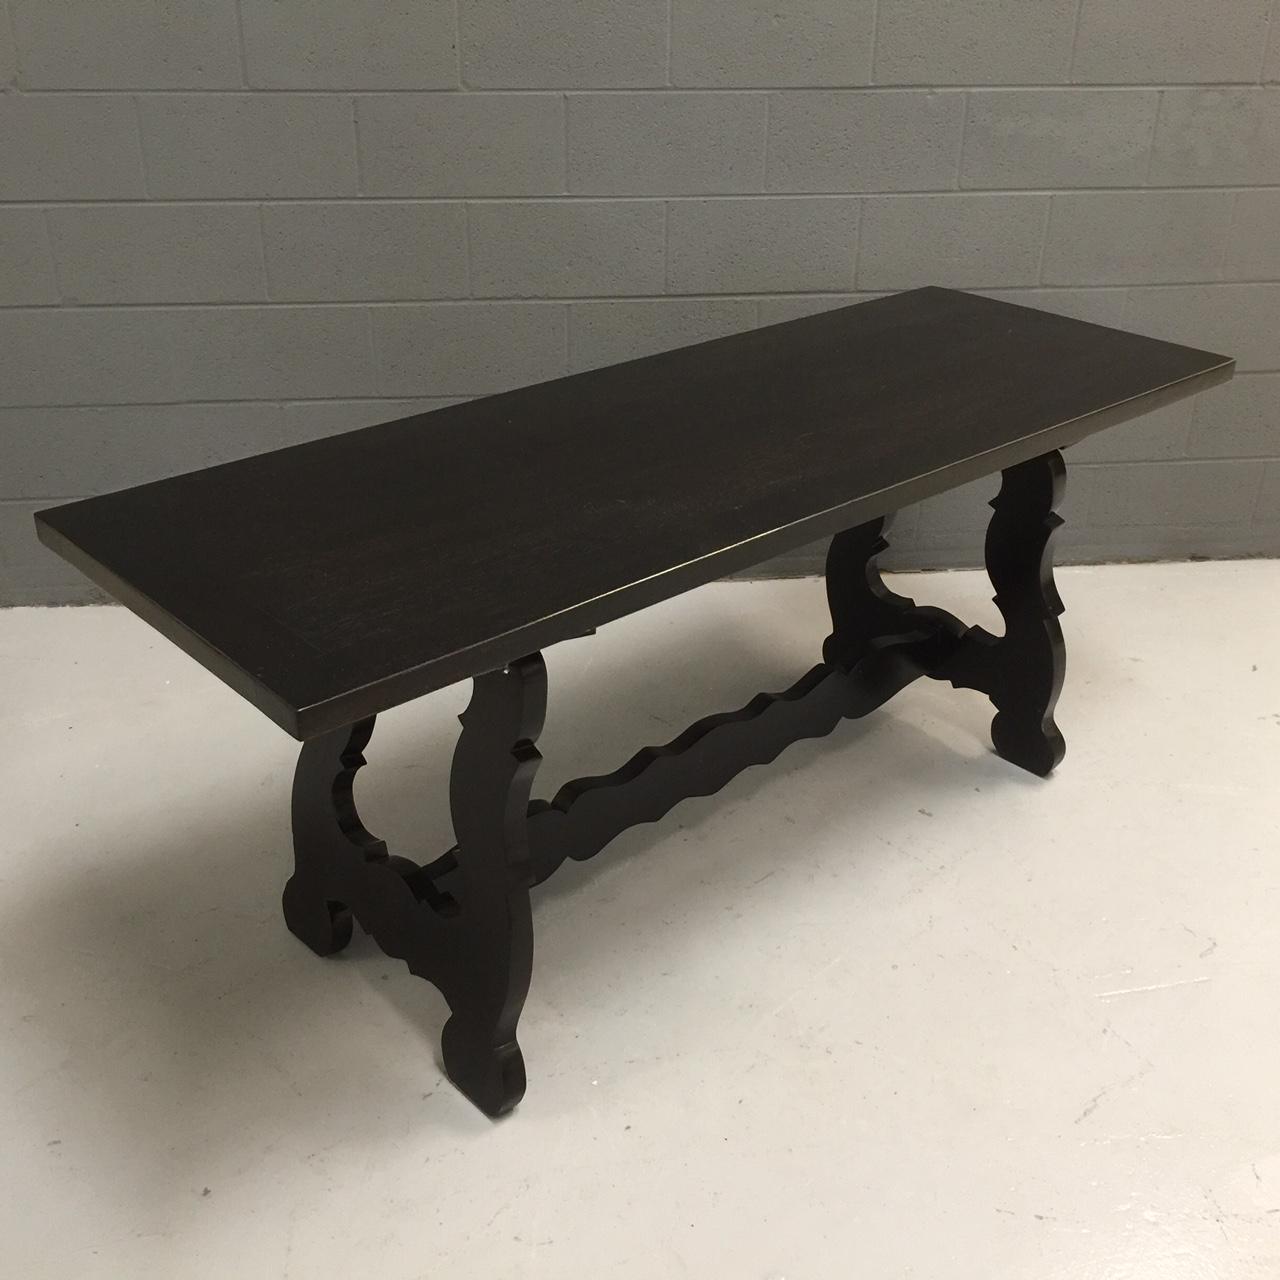 399 sofa store on thompson lane alister table desk monk 39s nadeau nashville